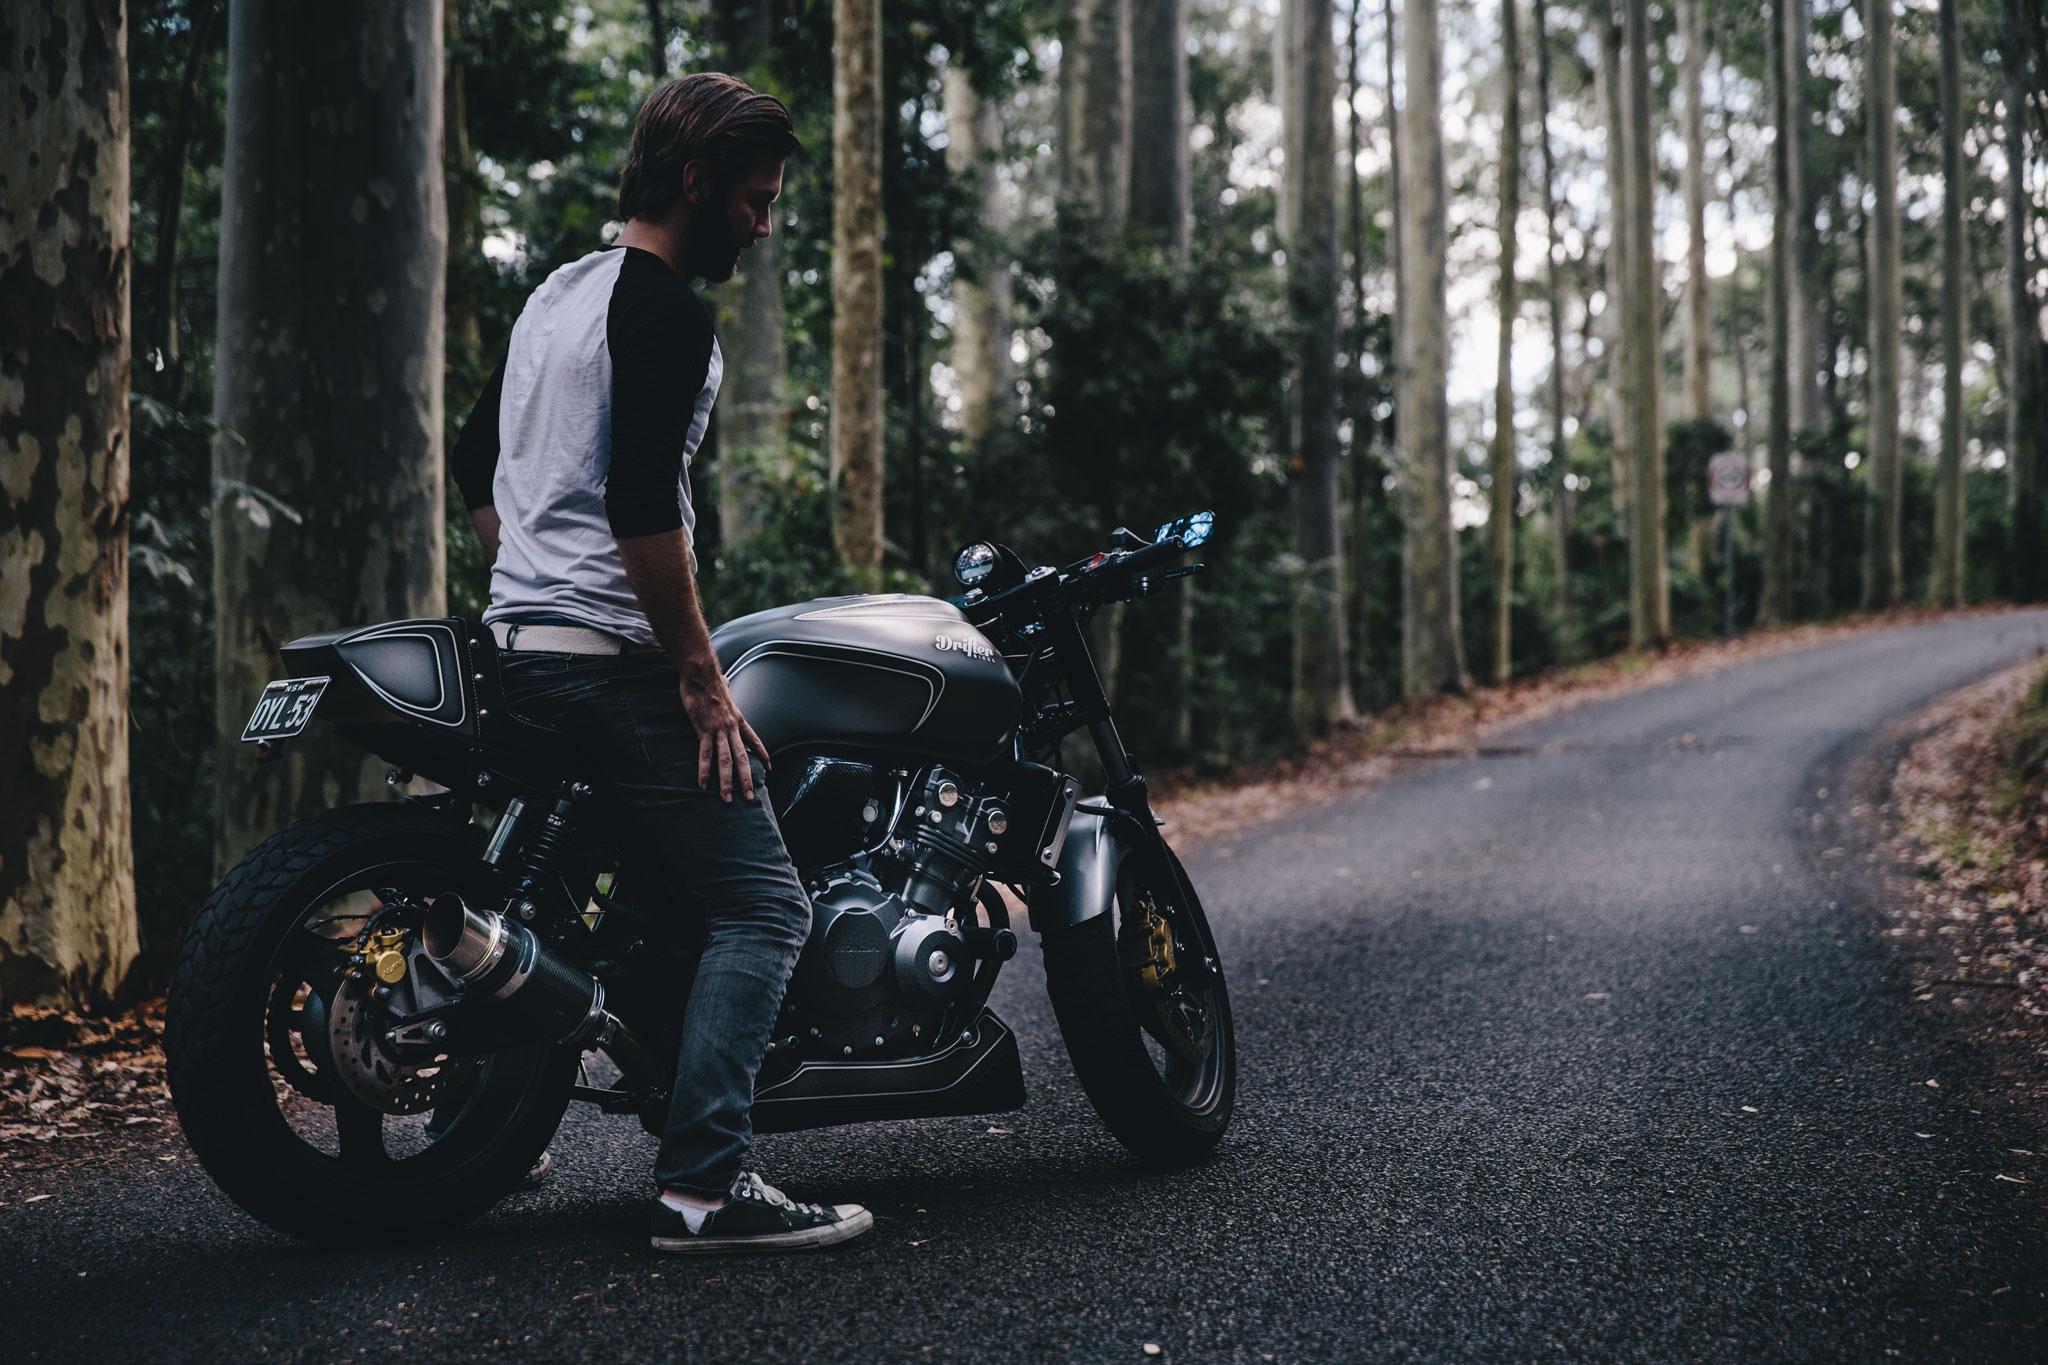 honda_cb400sf_drifterbikes_cafe_racer-65